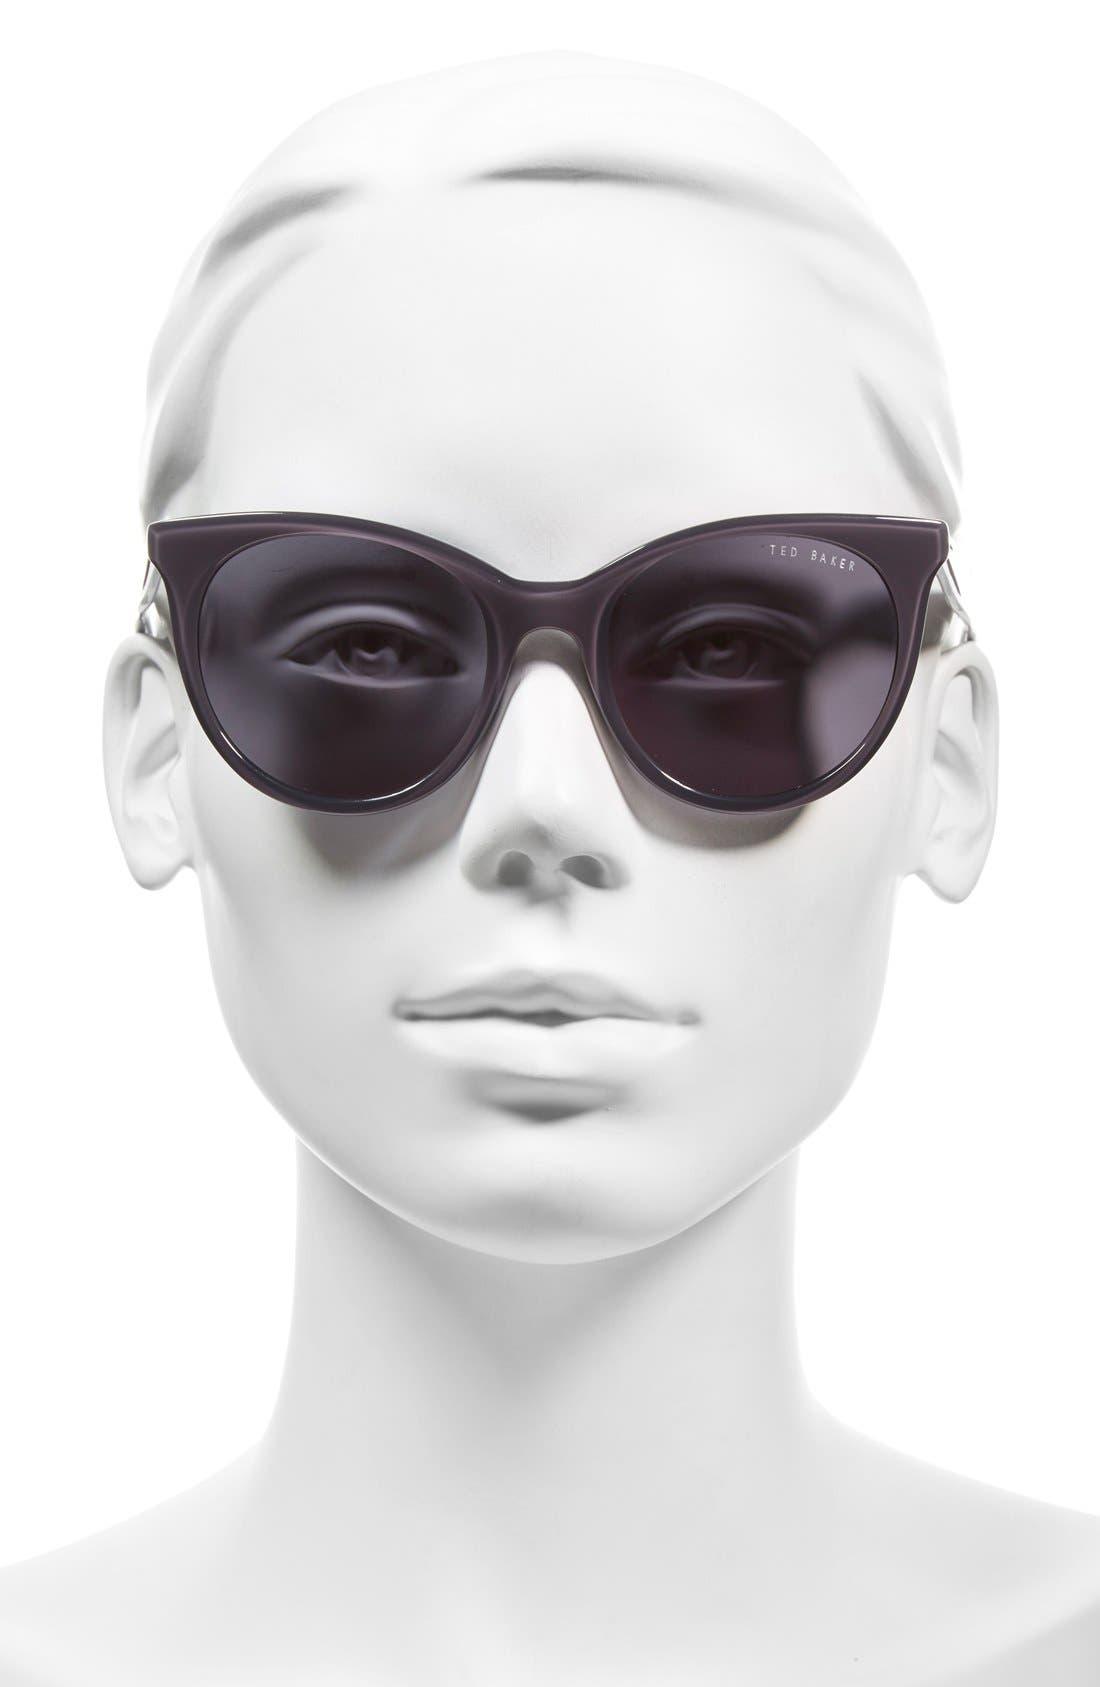 51mm Cat Eye Sunglasses,                             Alternate thumbnail 2, color,                             020